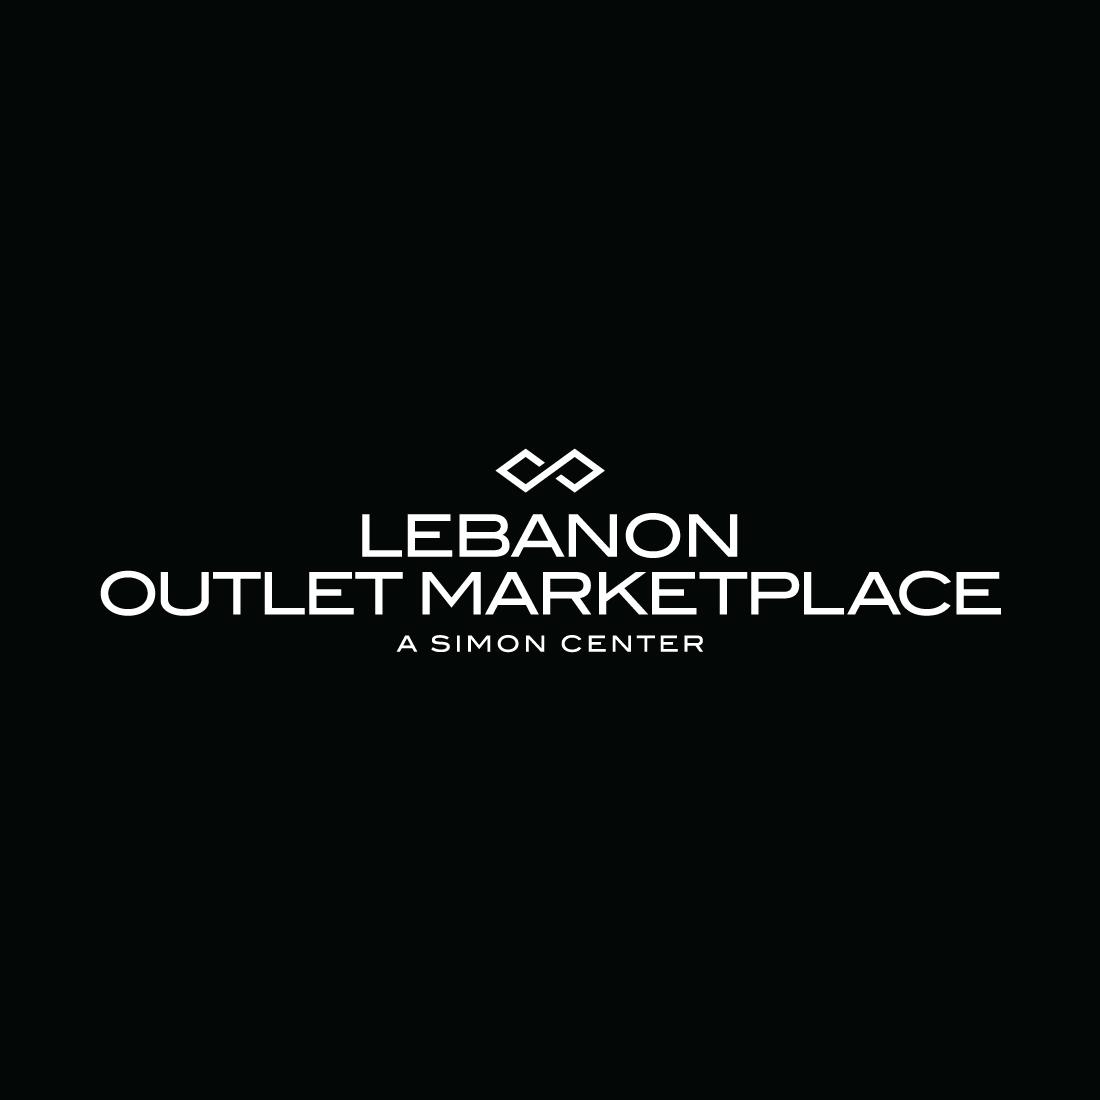 Lebanon Outlet Marketplace image 20